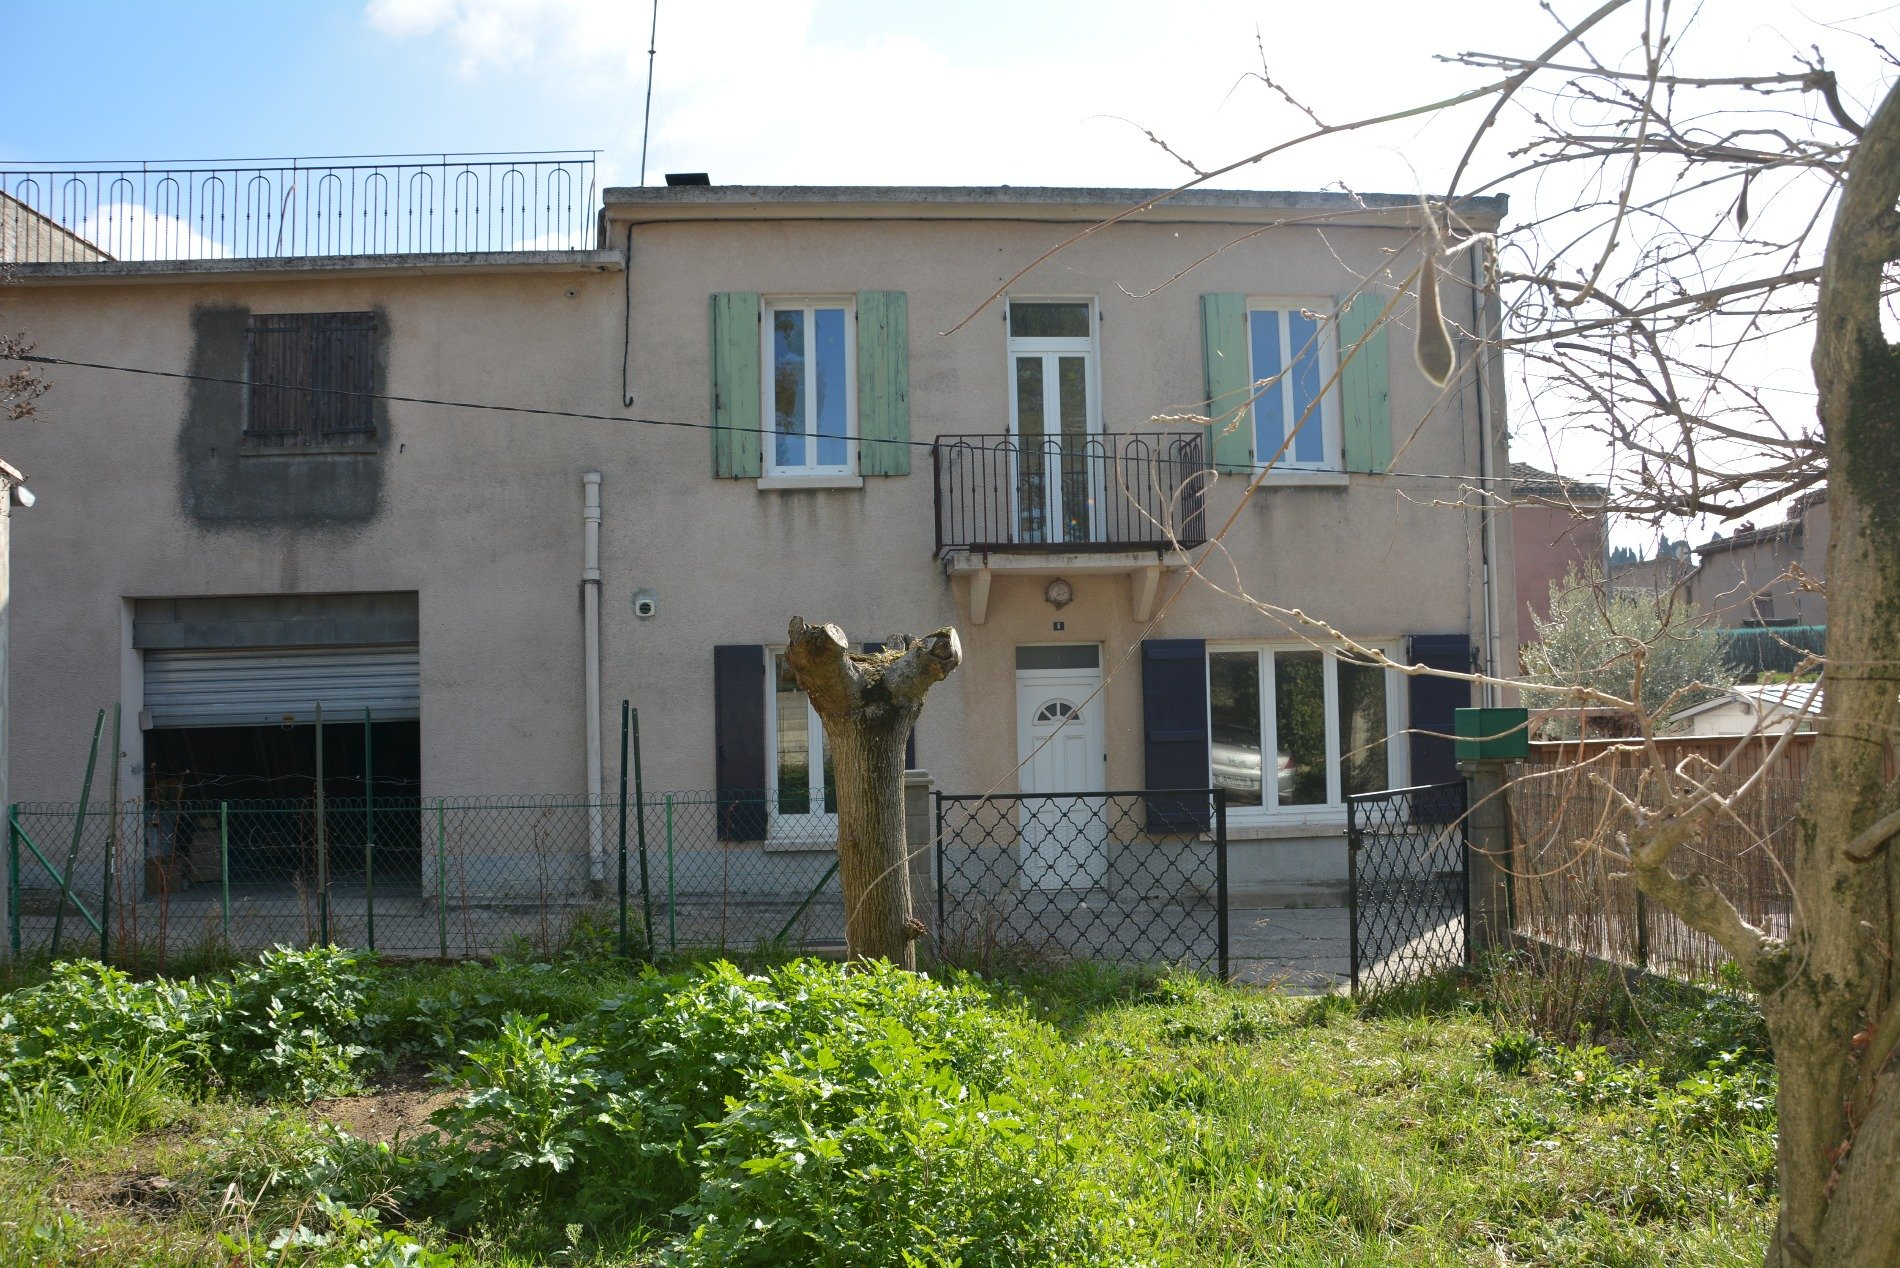 Maison CARCASSONNAIS | 139 500 €